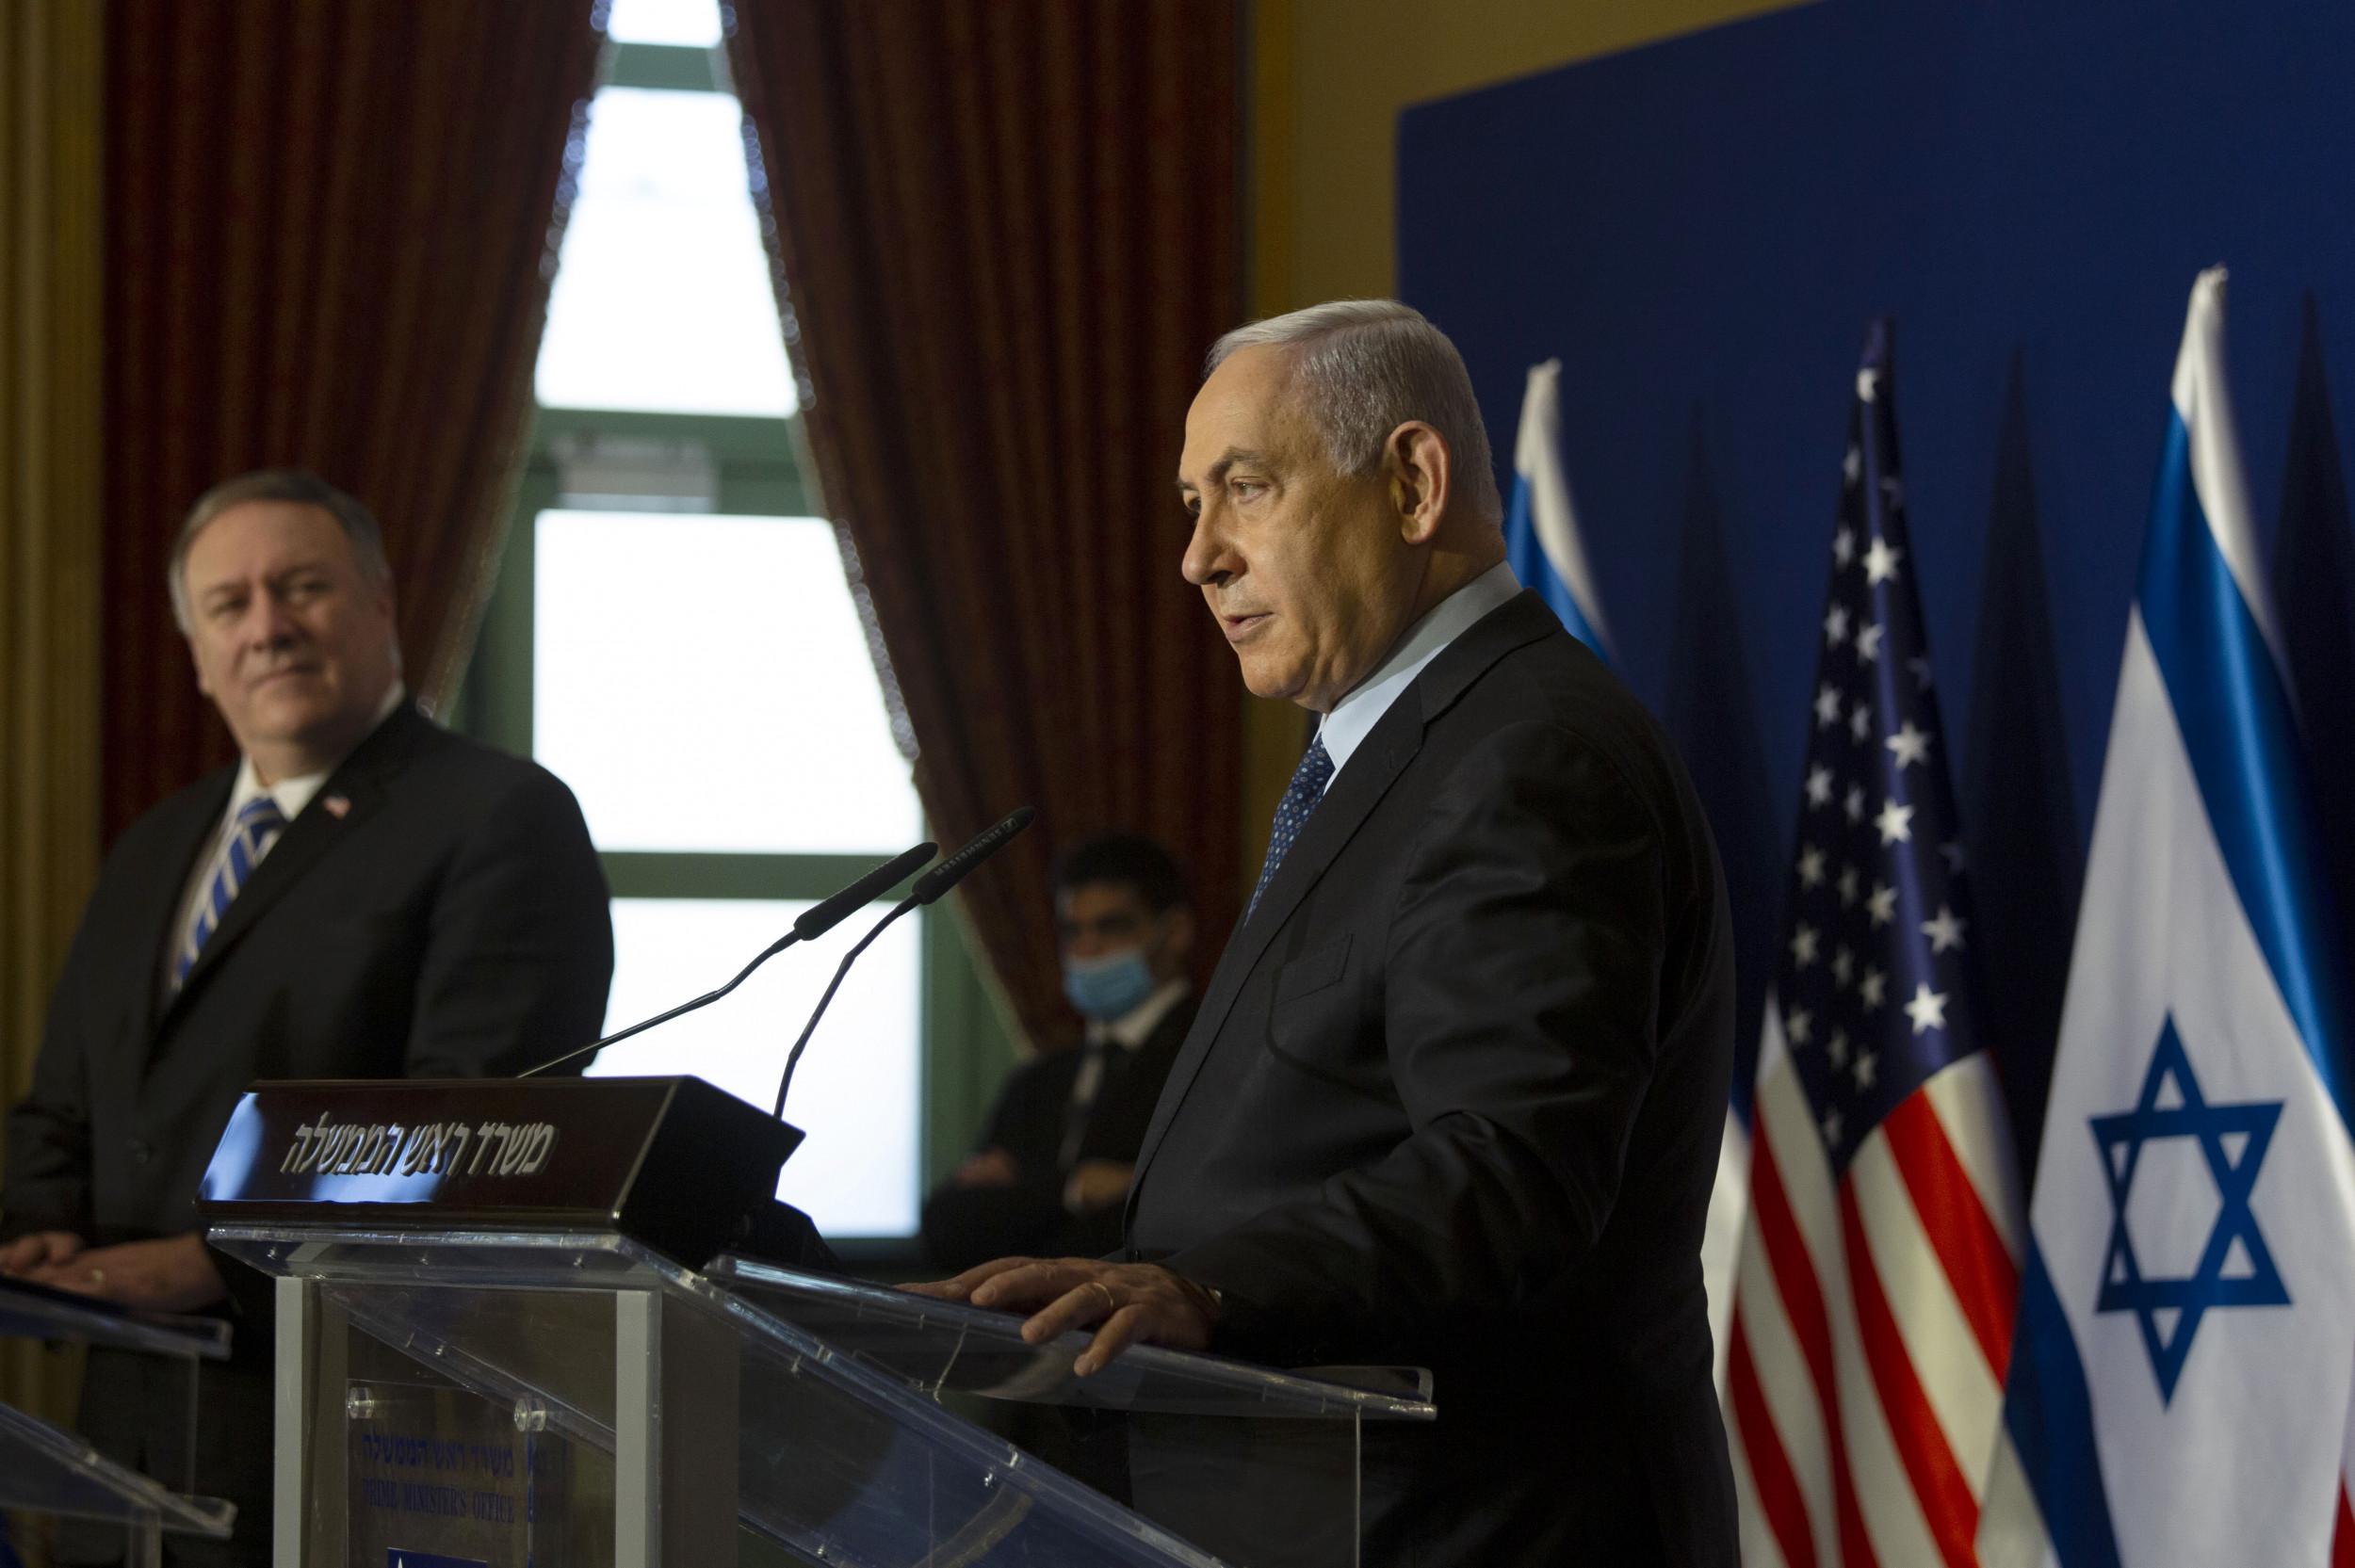 As Iran vows to avenge slain scientist, Saudi-Israel peace talks reportedly break down